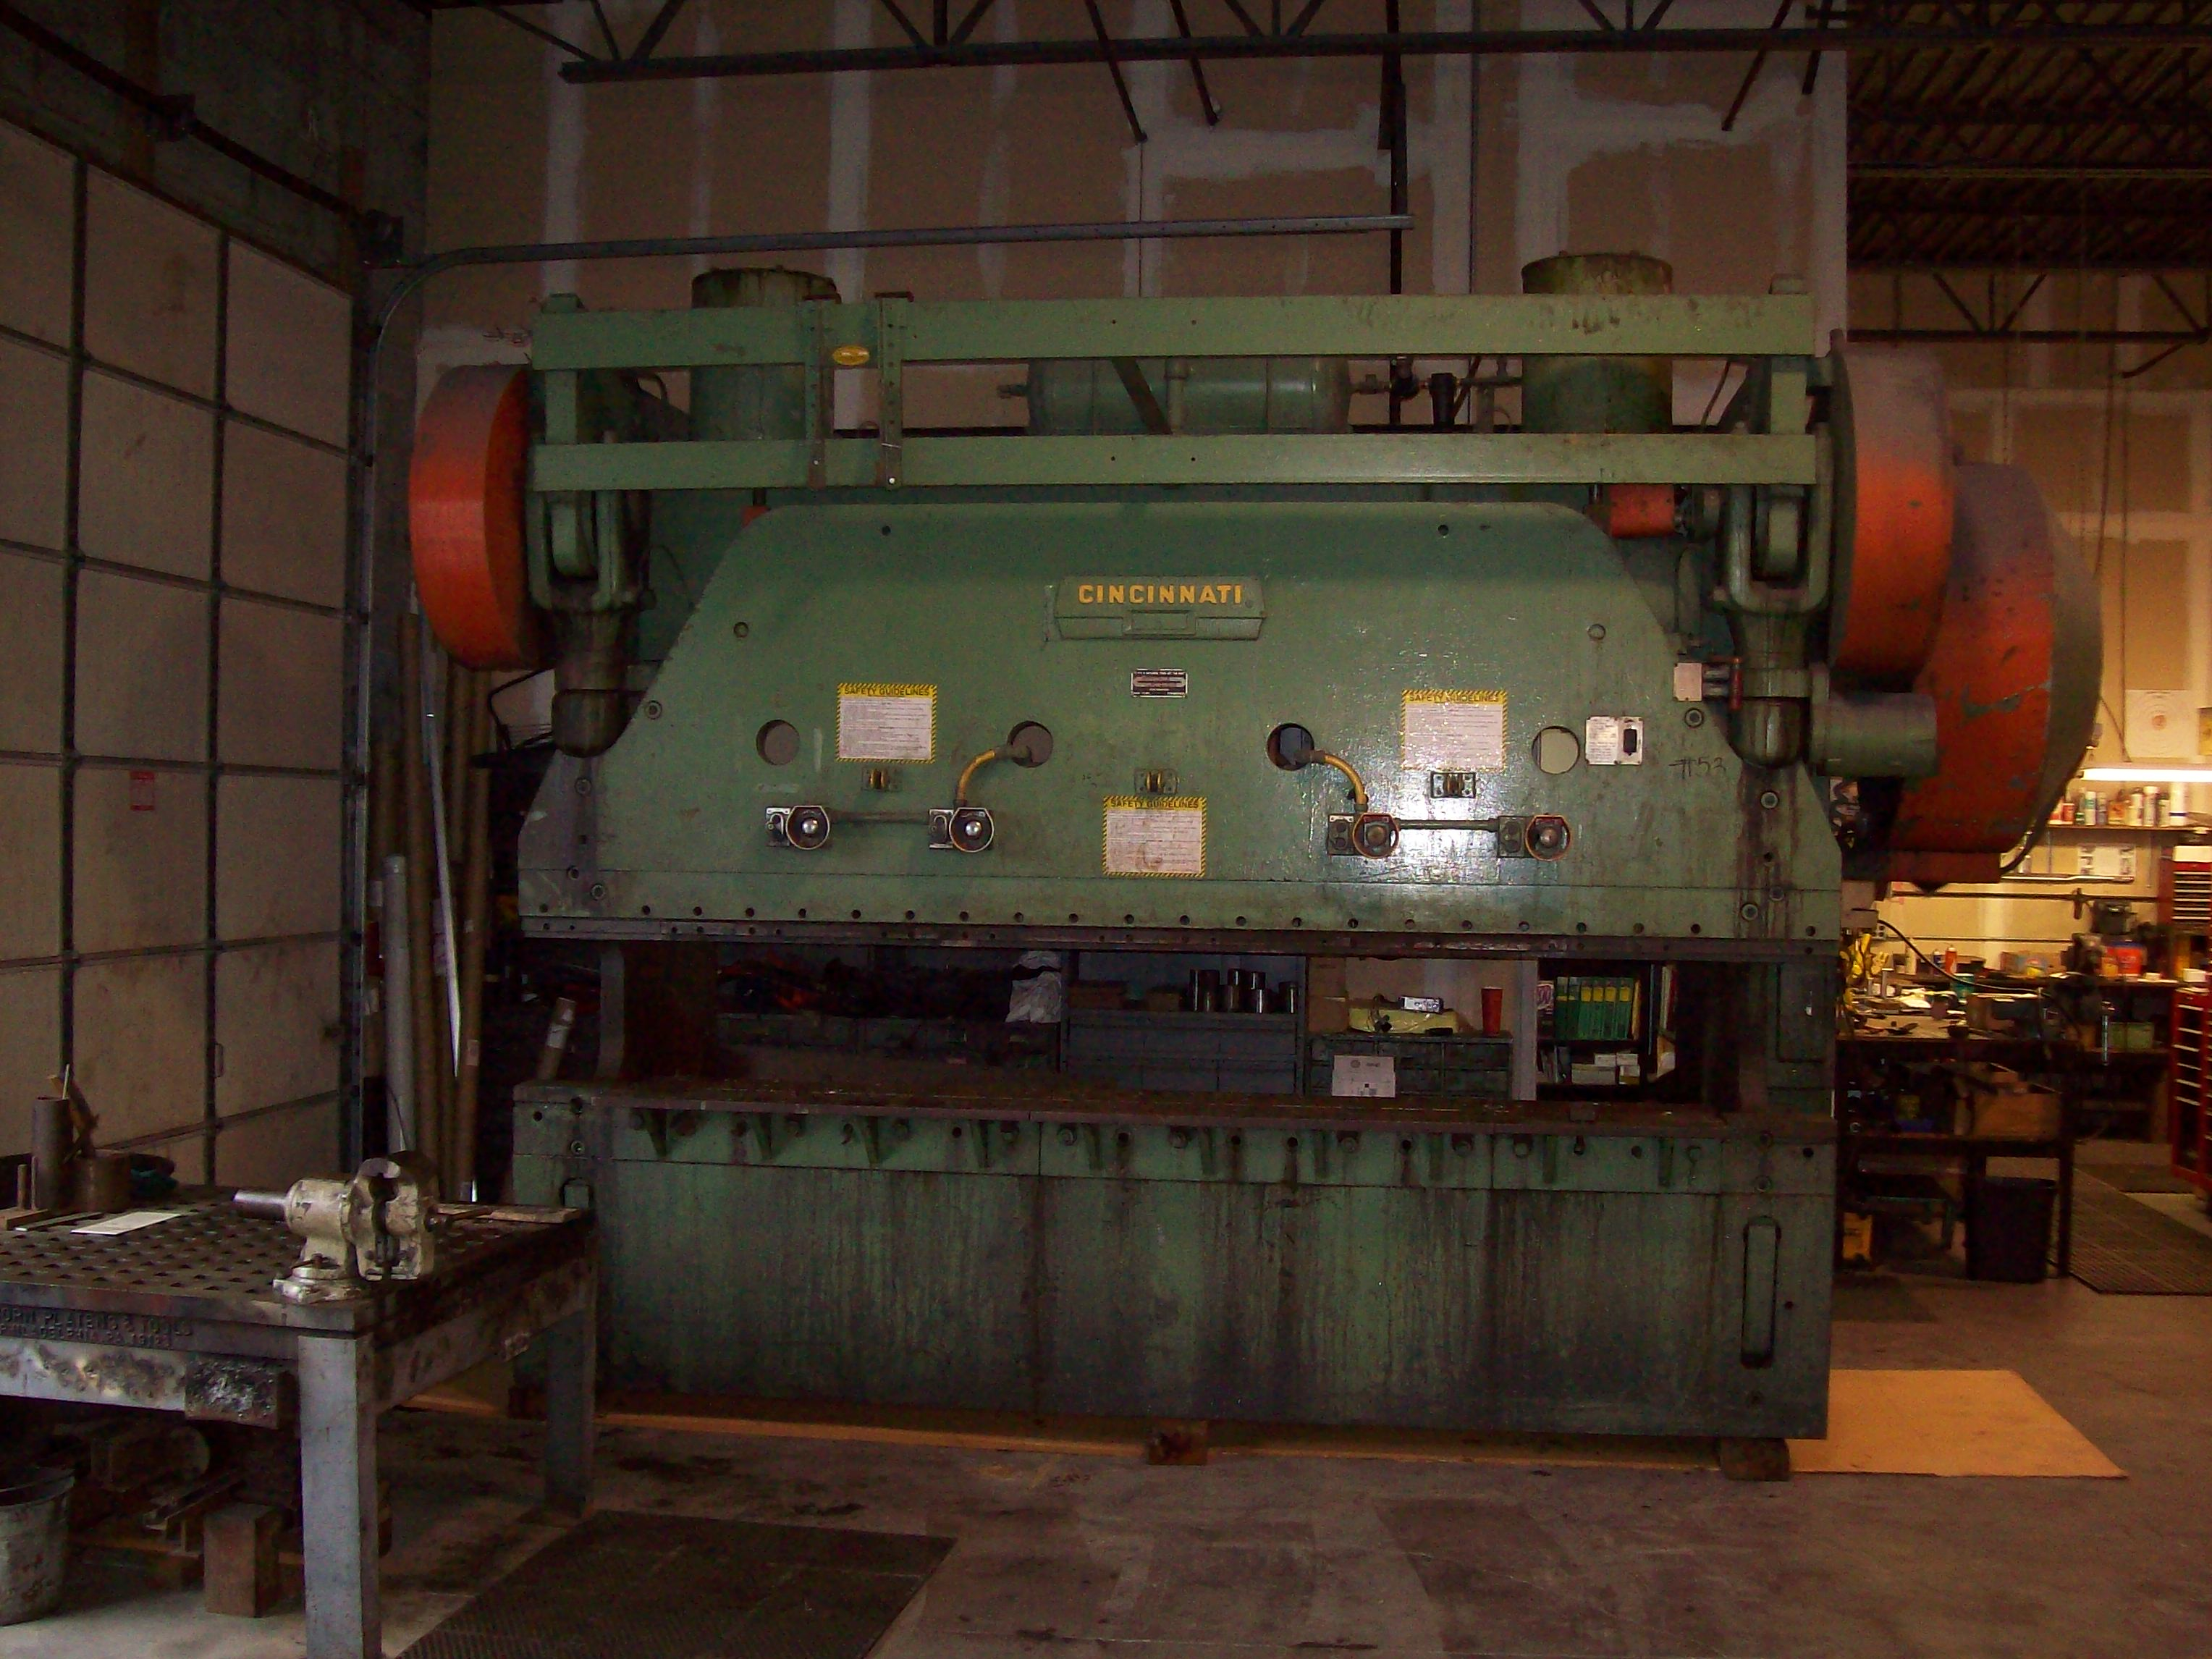 Cincinnati press brake rebuildin